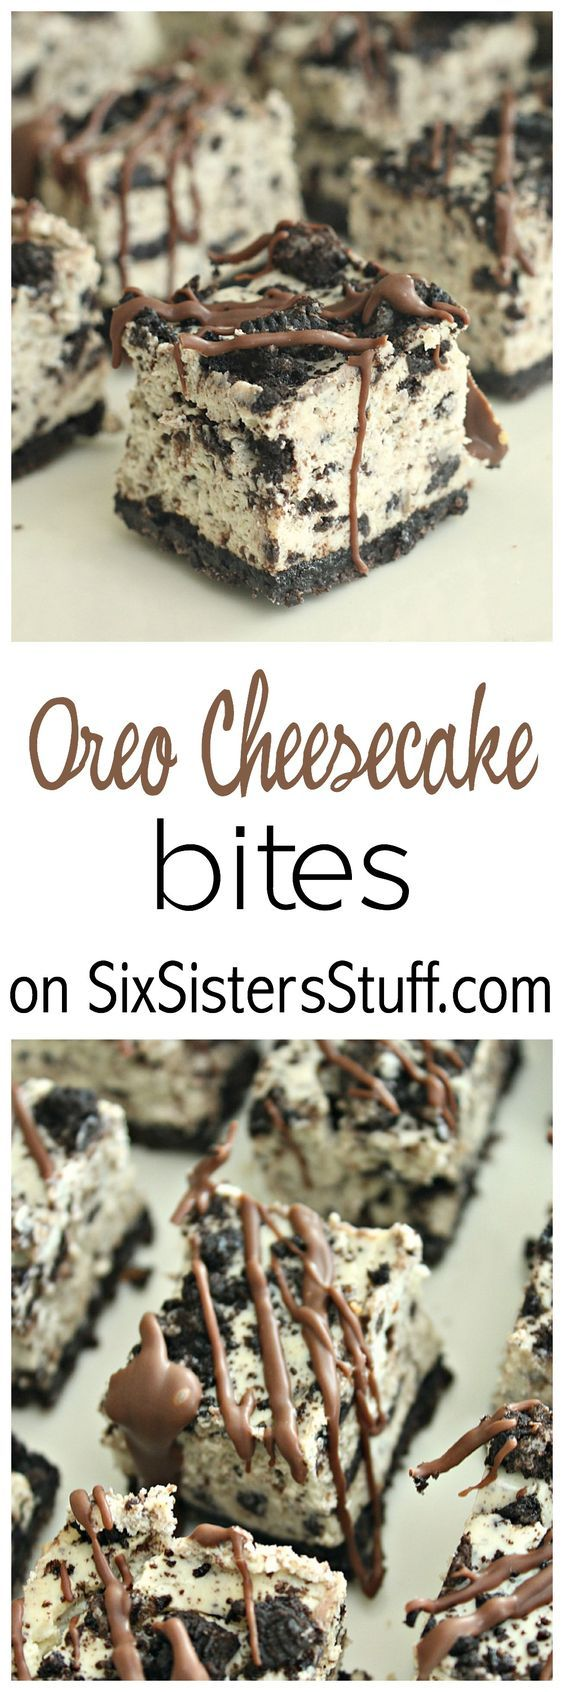 Oreo Cheesecake Bites only on SixSistersStuff